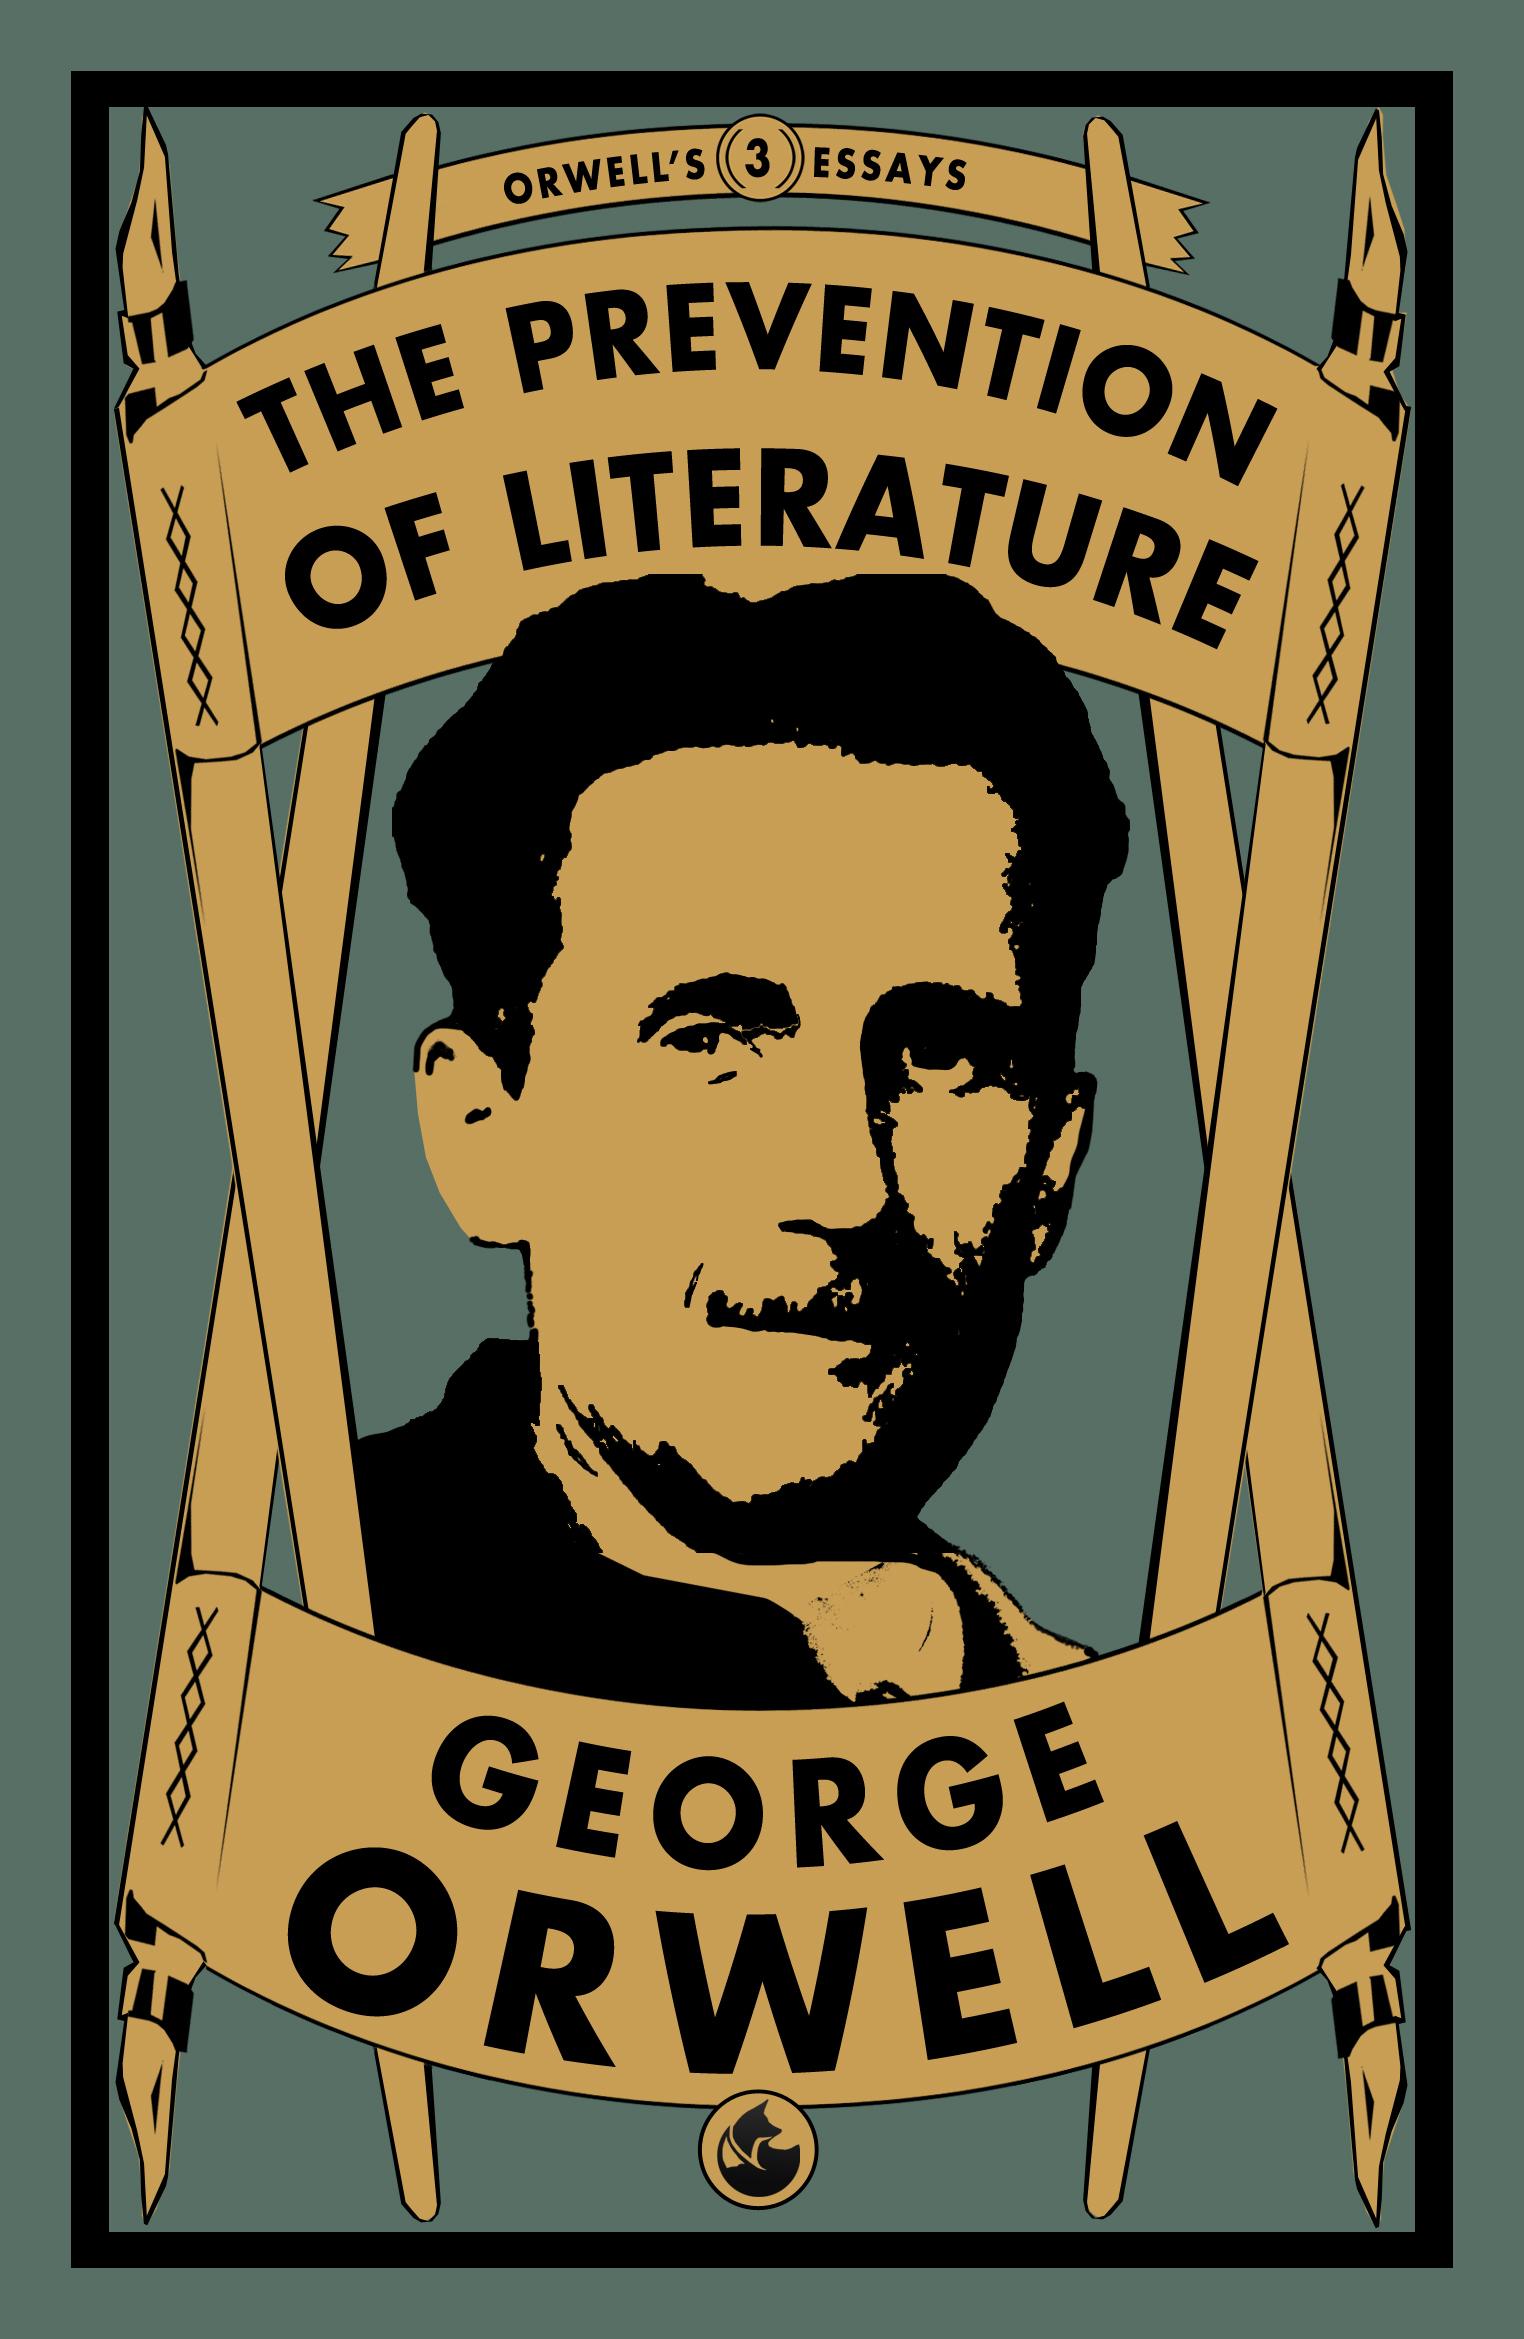 The Prevention of Literature